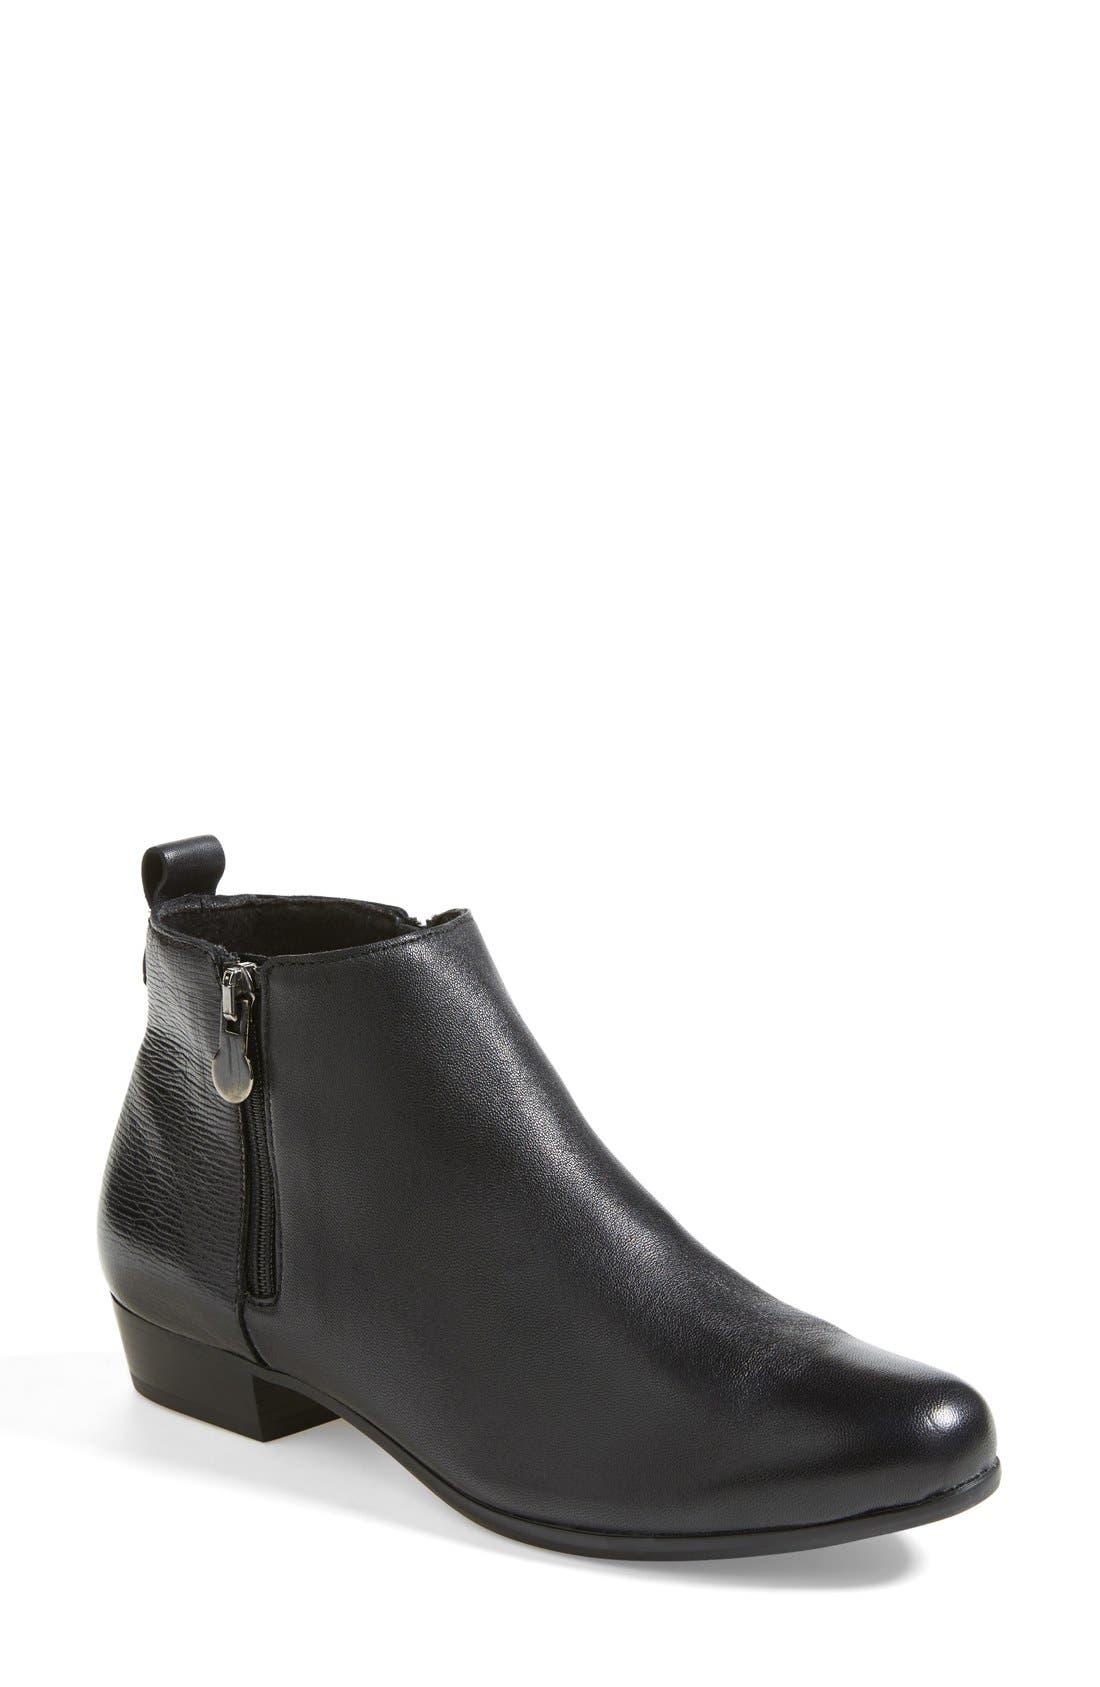 Munro Lexi Boot, Black